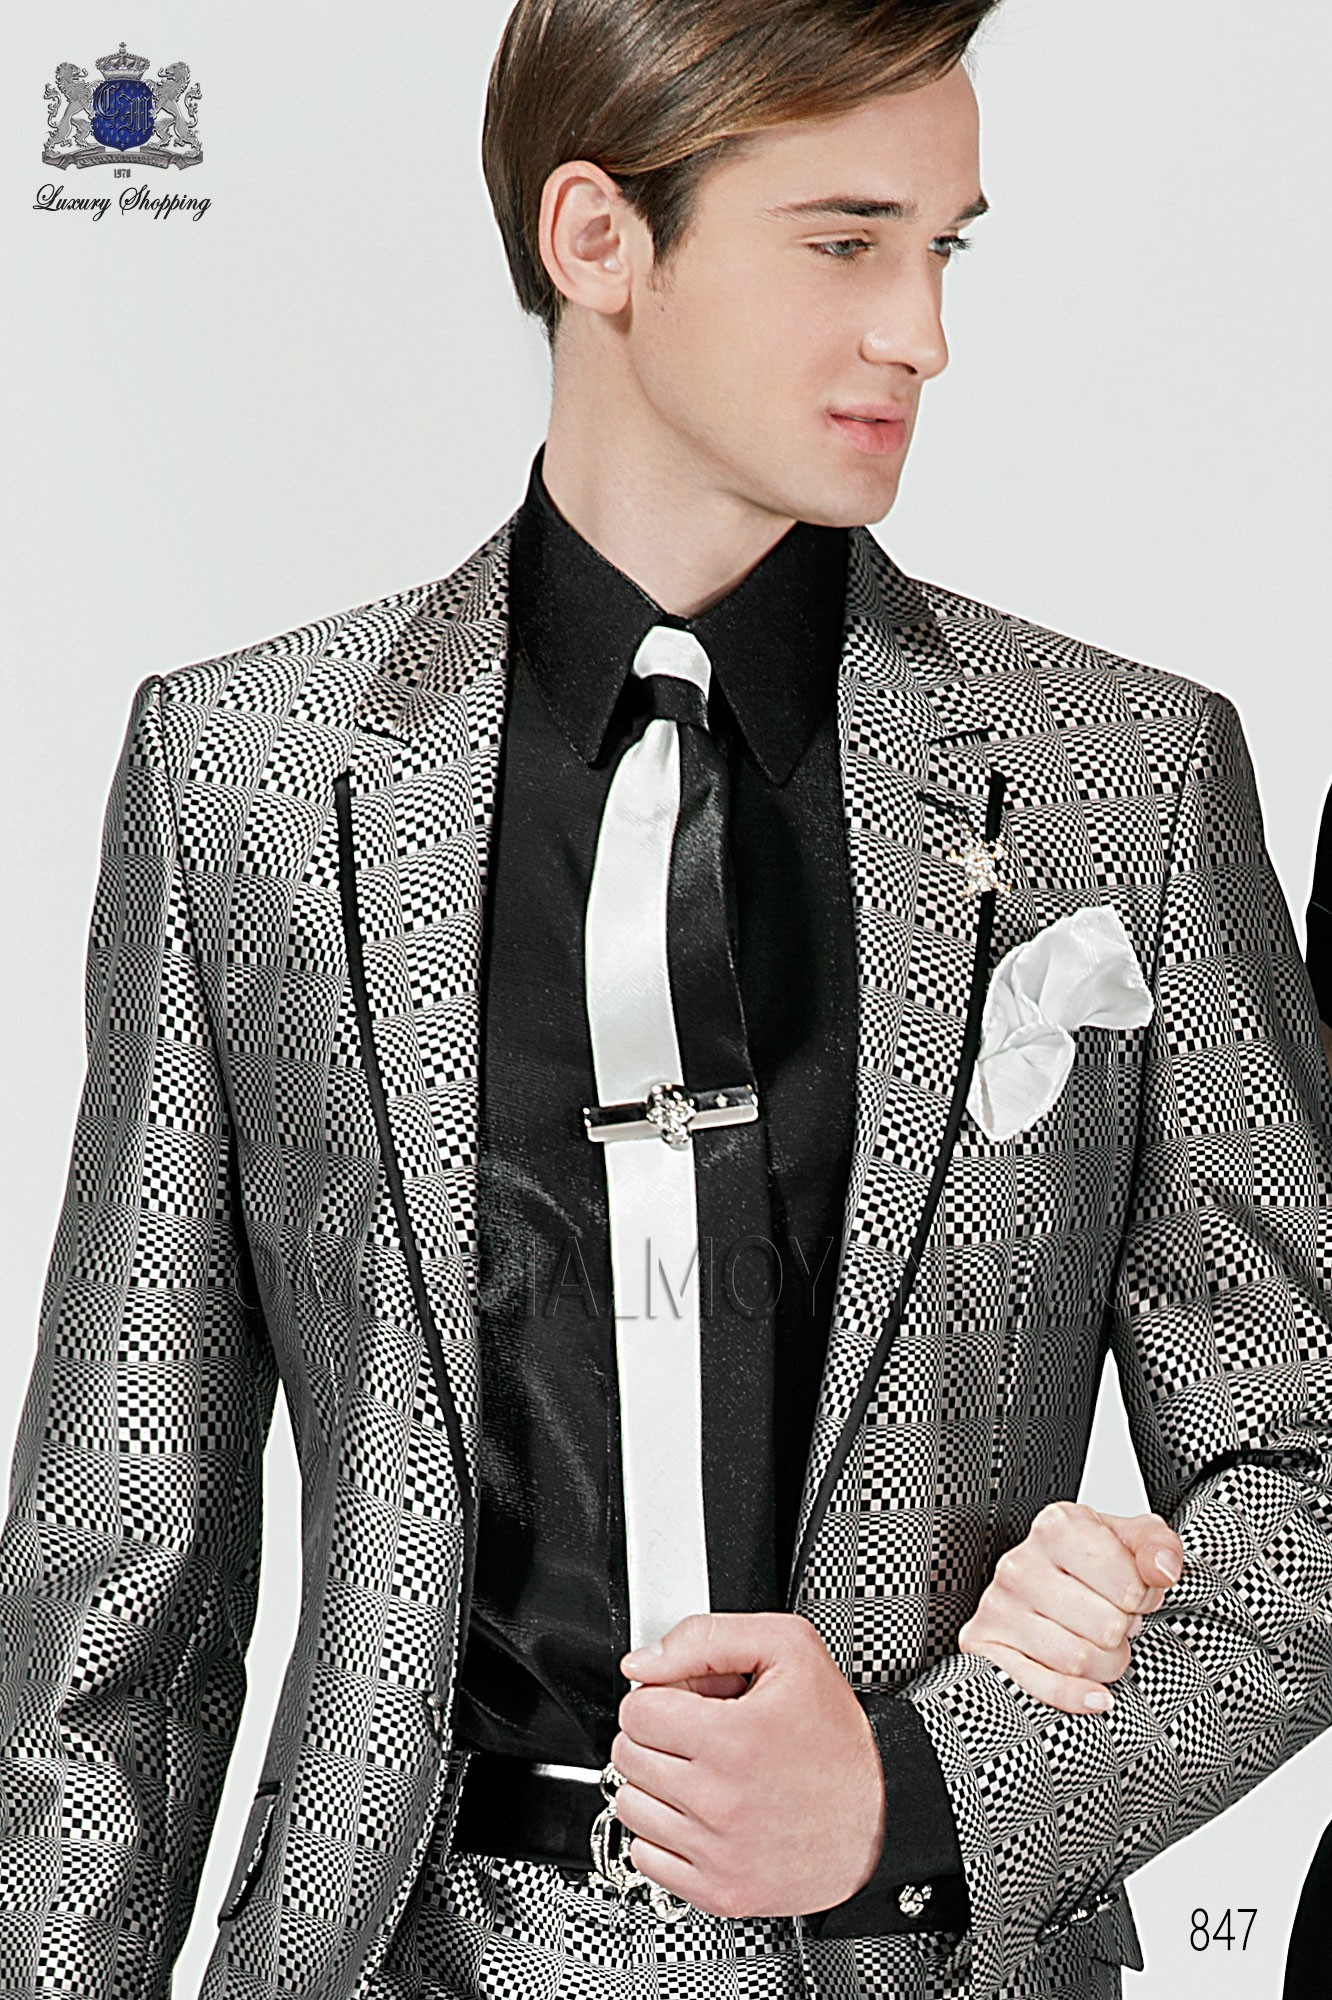 Italian emotion white-black men wedding suit, model: 847 Ottavio Nuccio Gala Emotion Collection